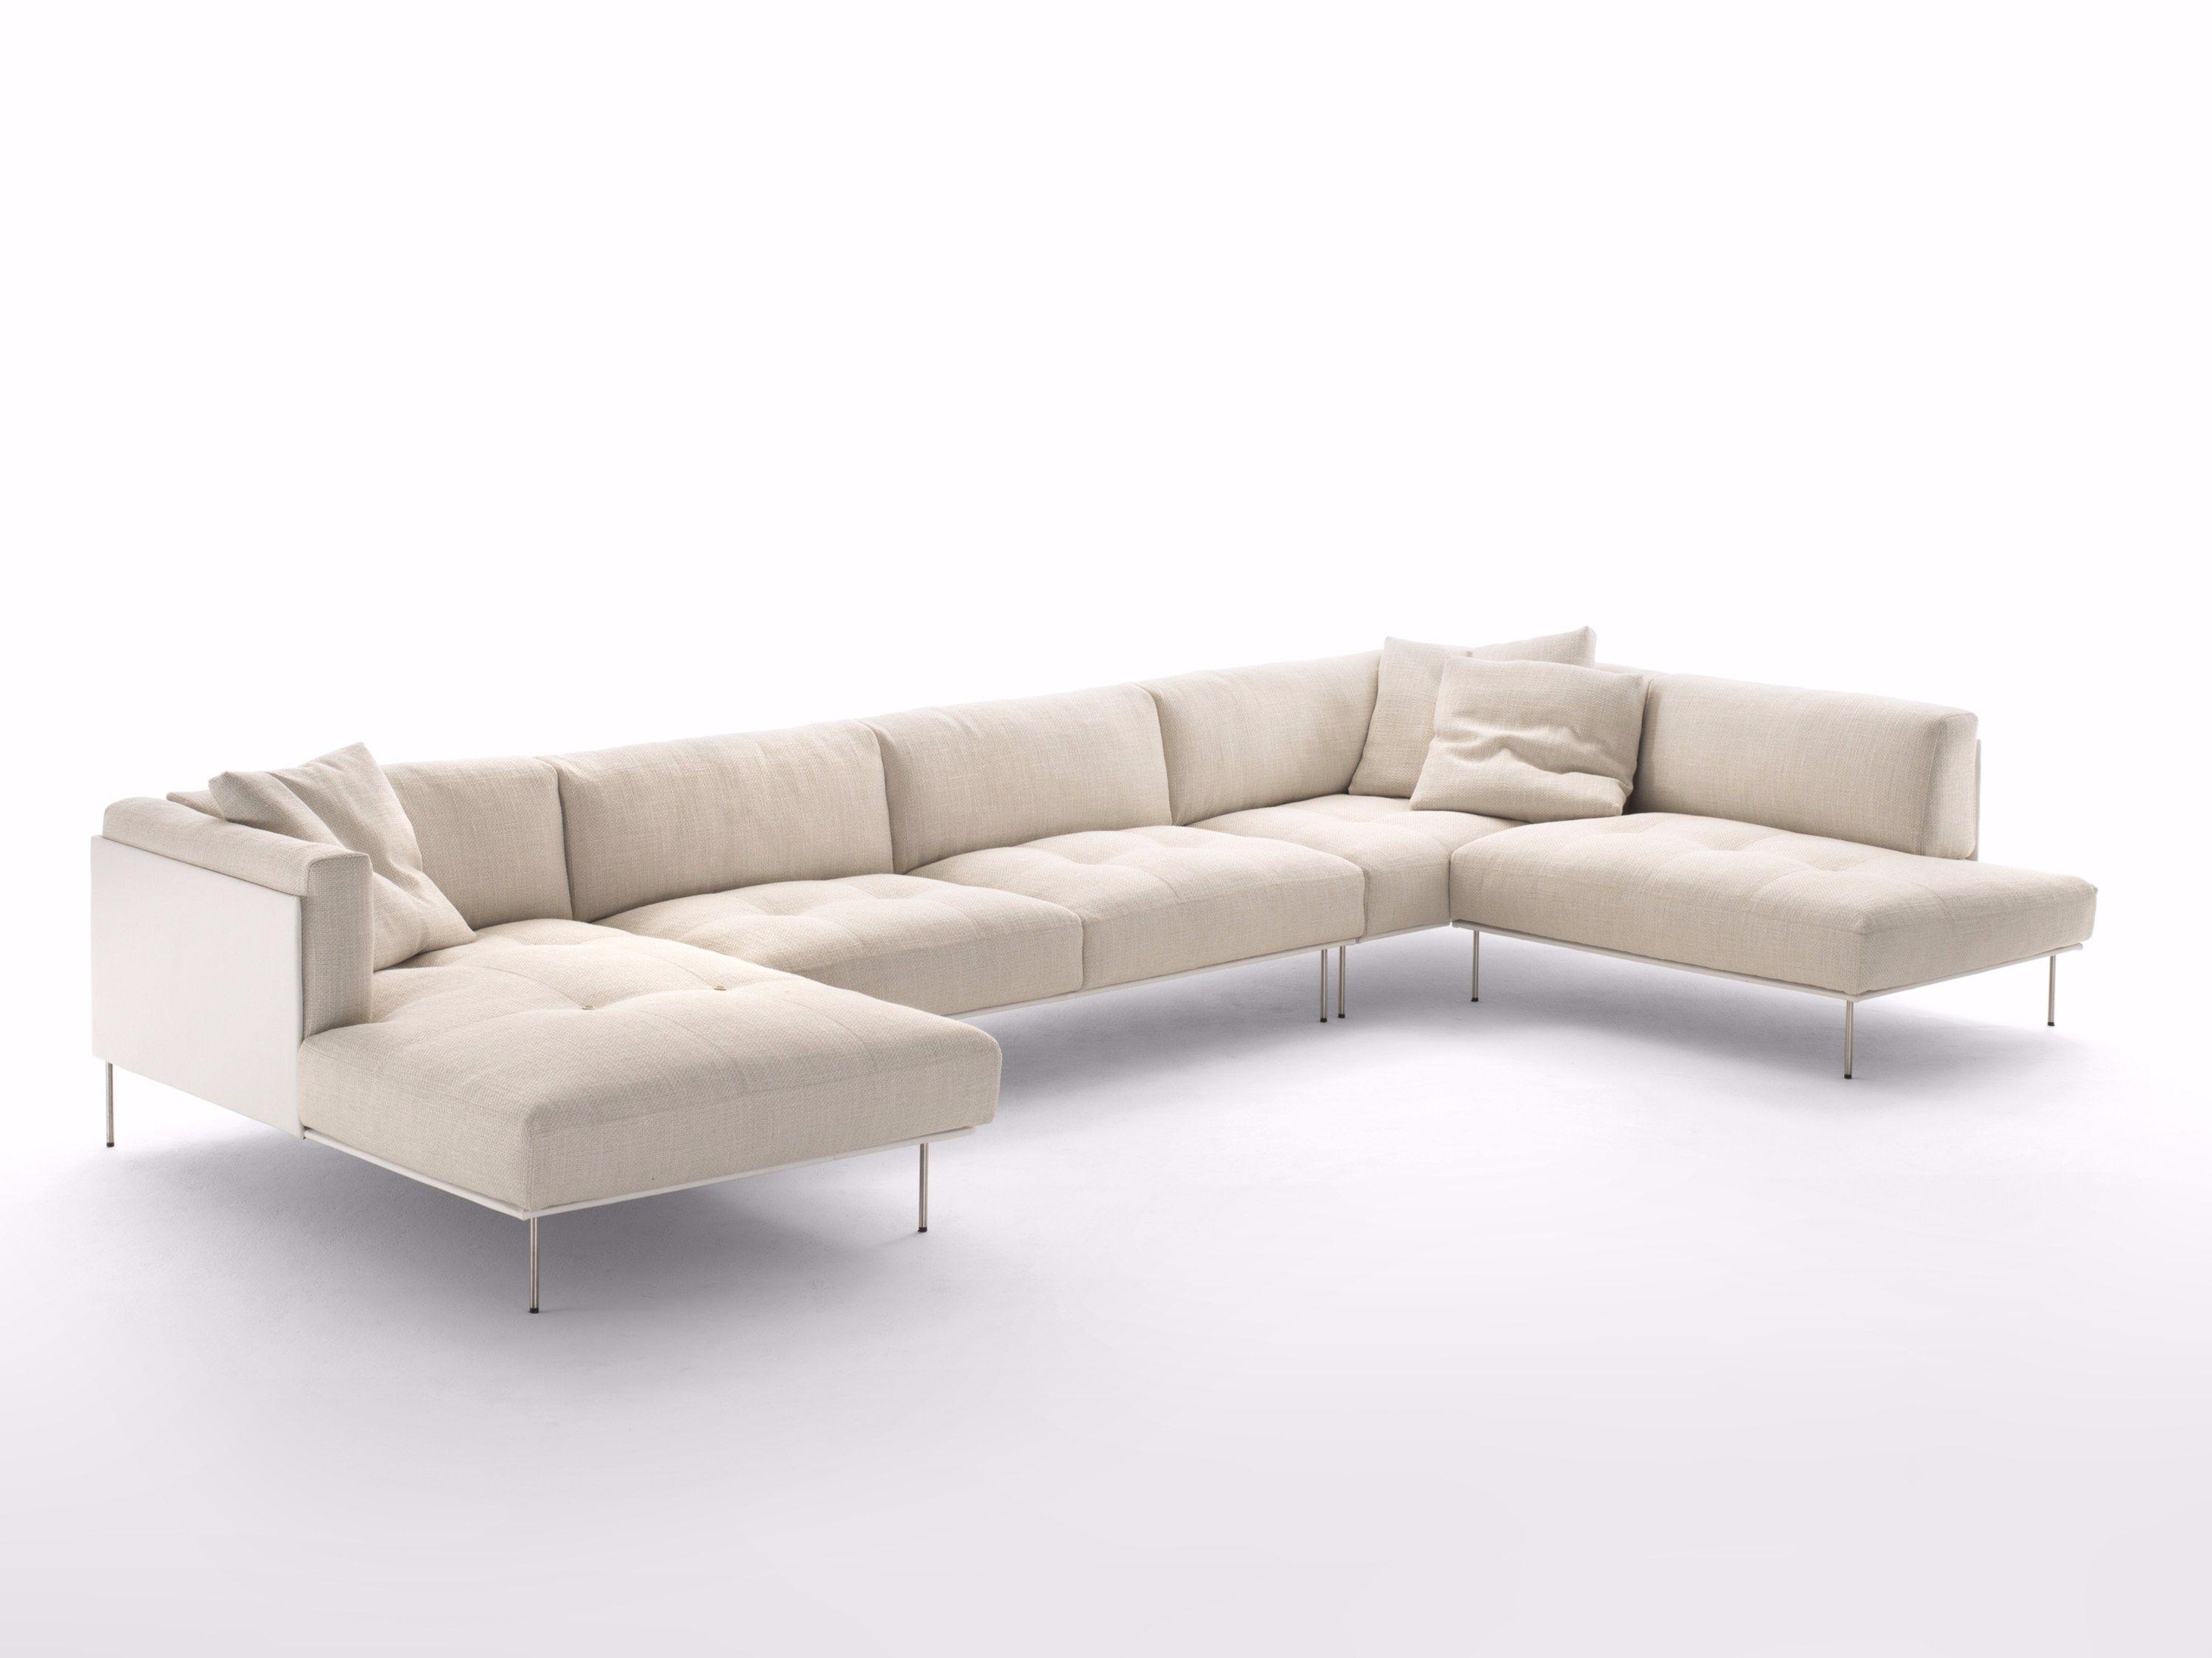 Sofa Bit Th C Bn Kp Gia V K G Lin Bn Hng Kiu Ng Hin